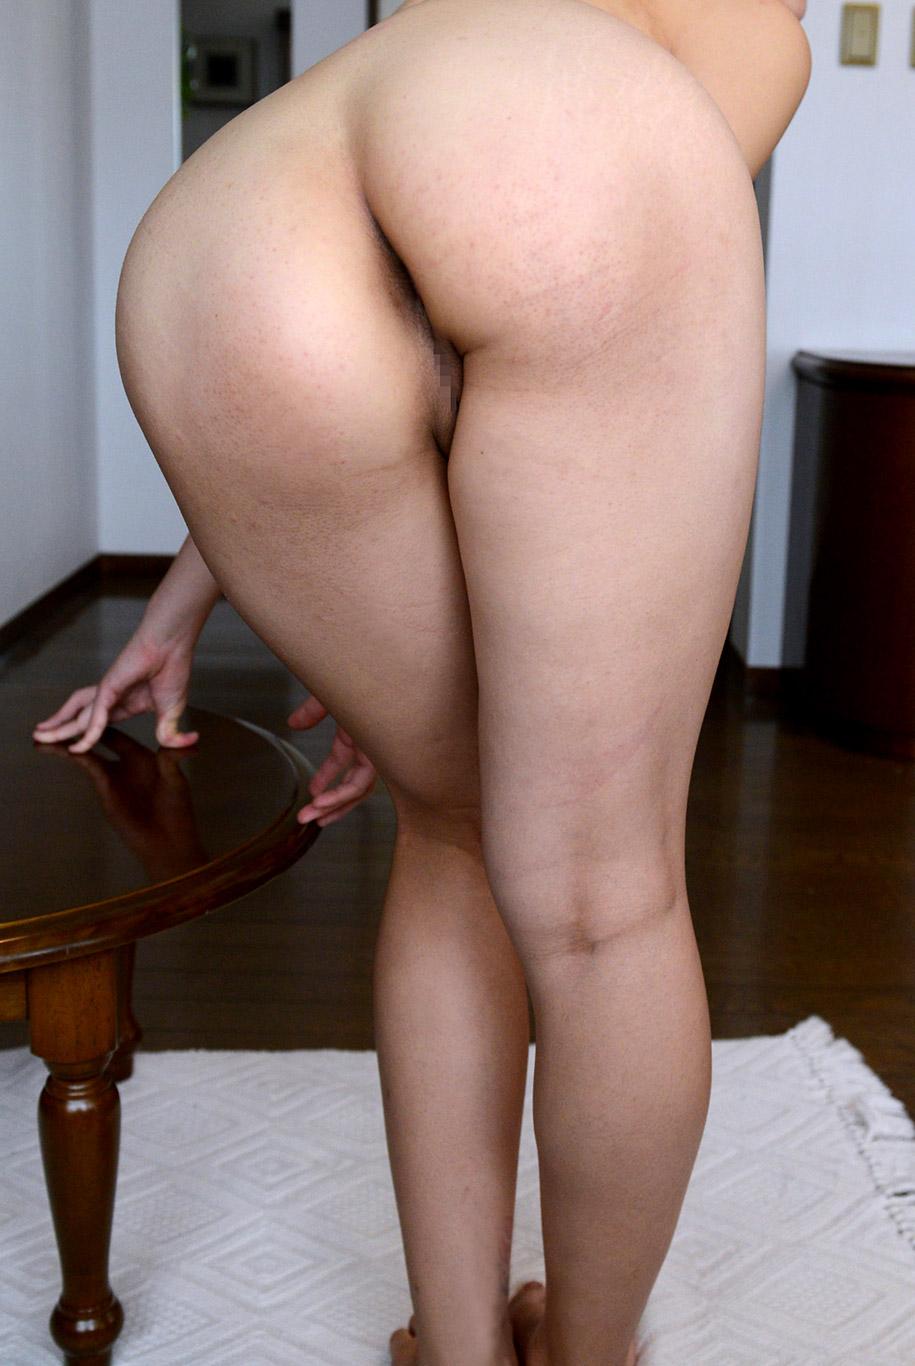 I love nice tits